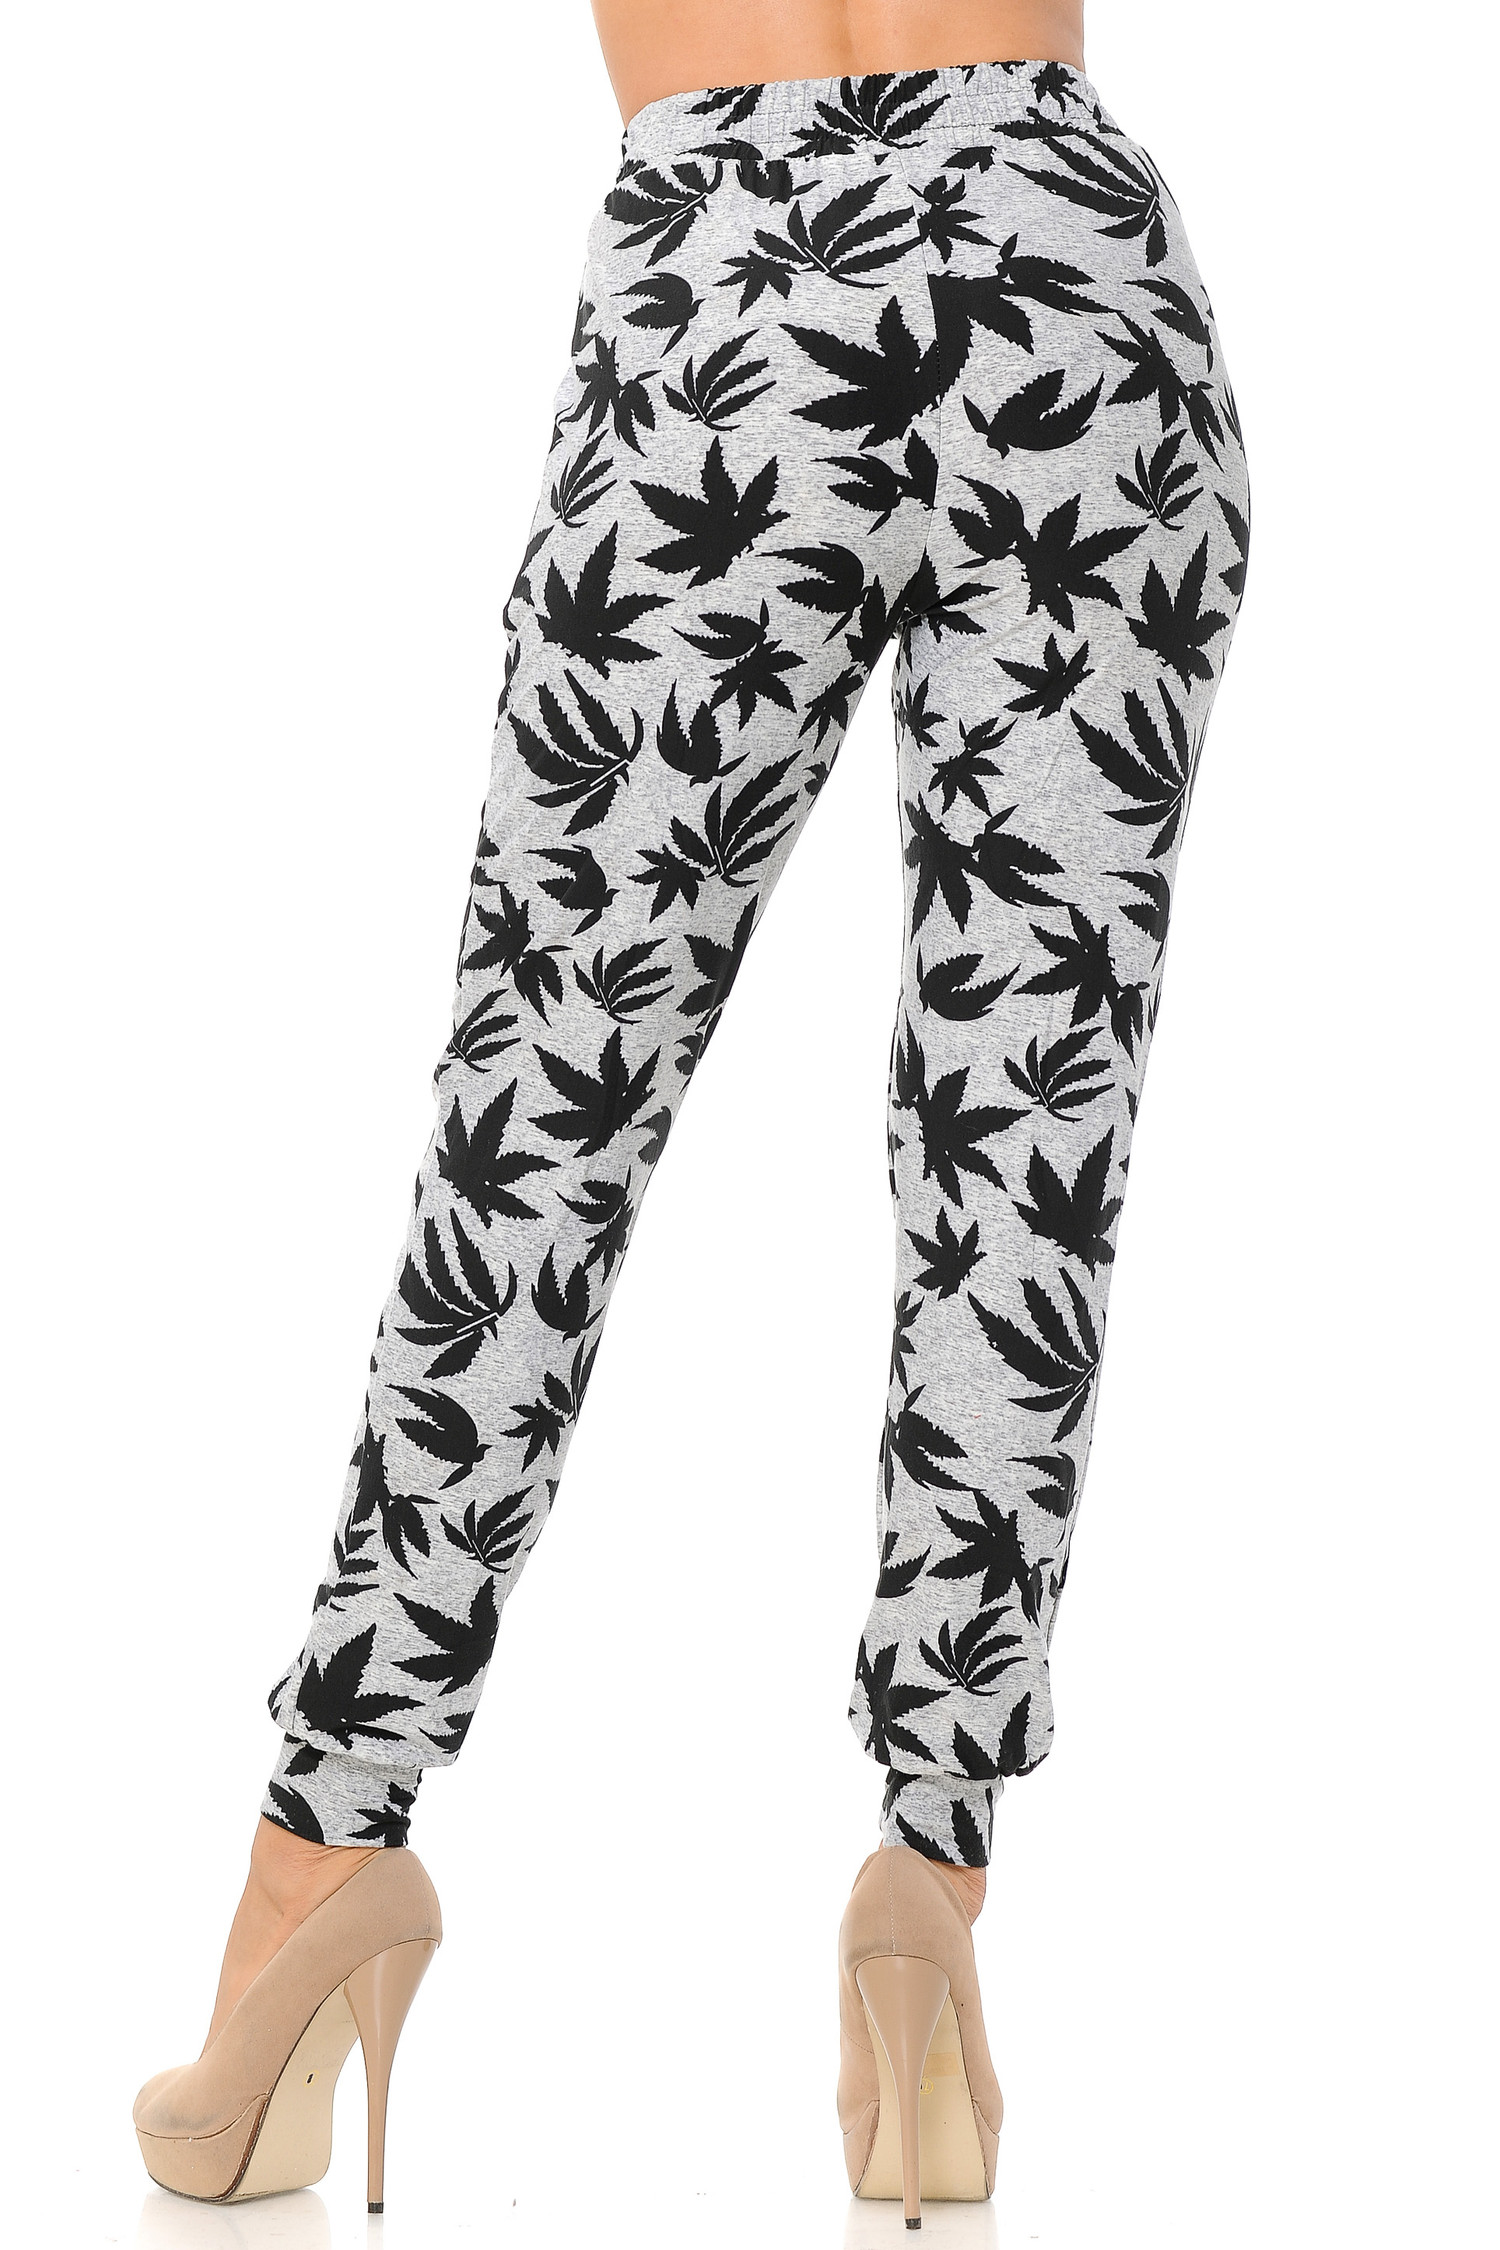 Brushed Solid Heather Grey Marijuana Joggers